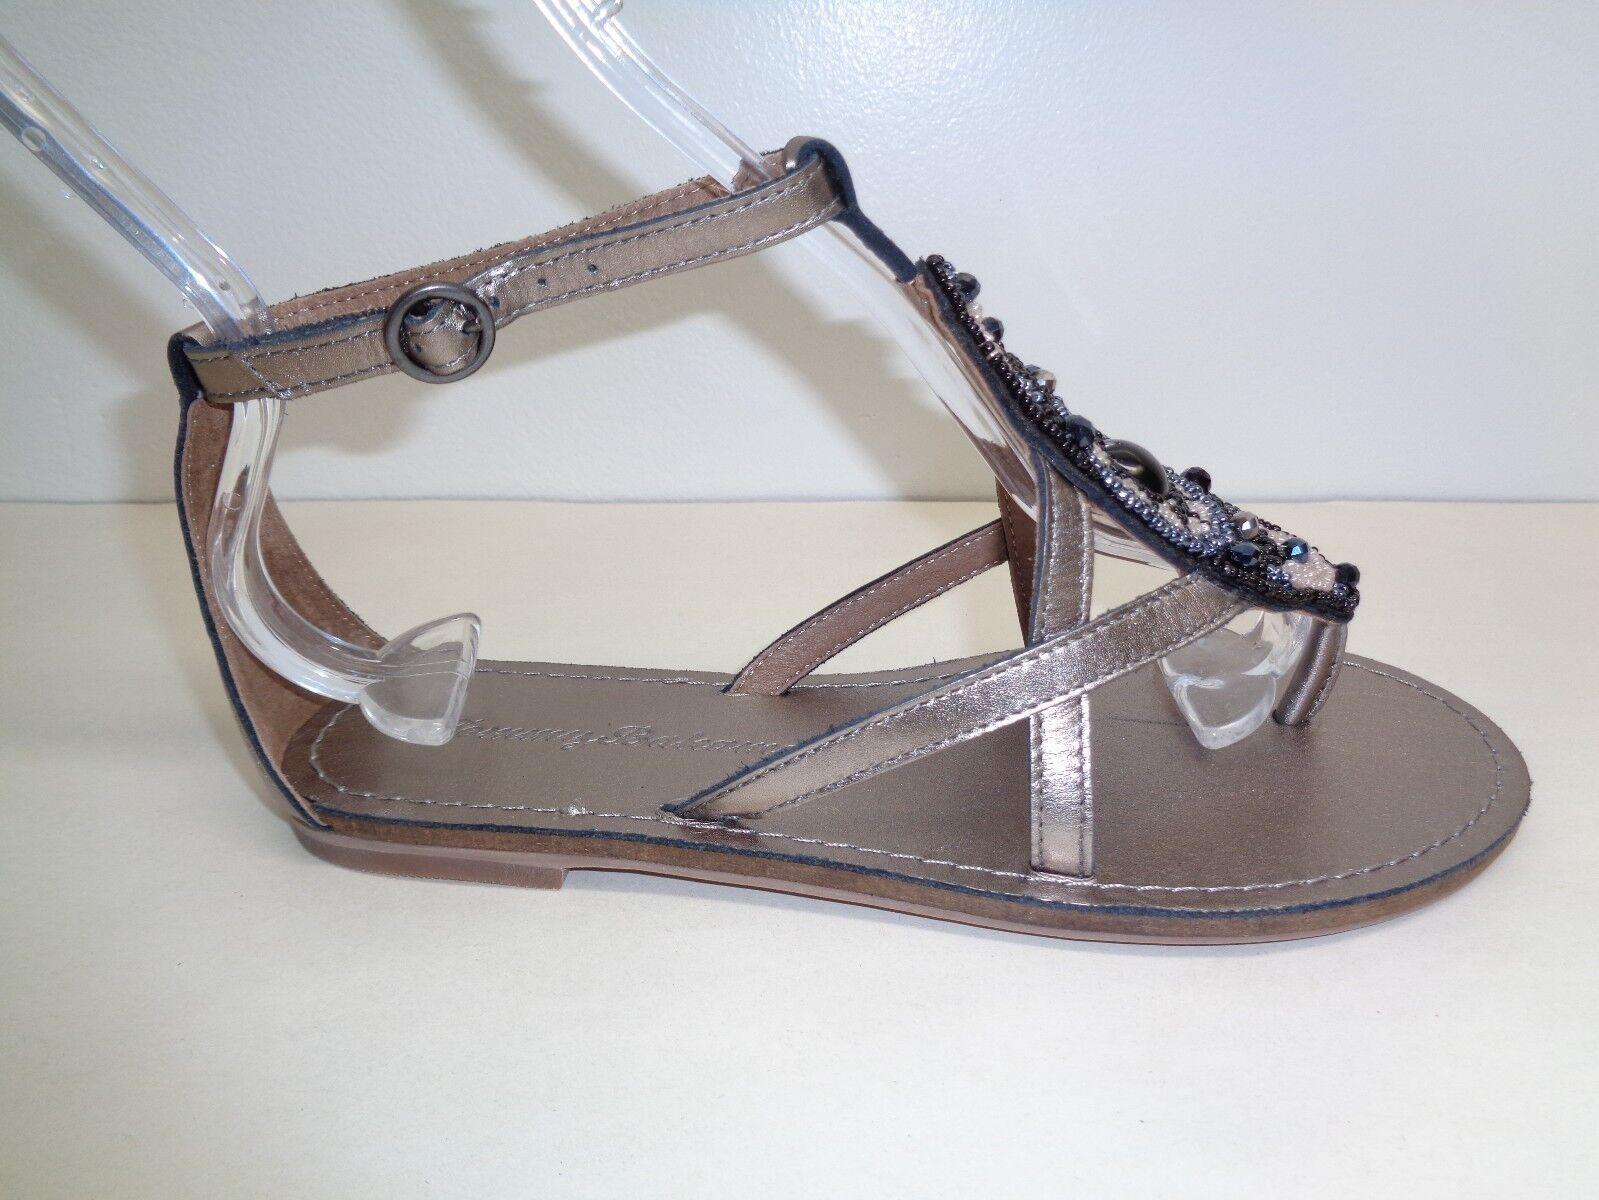 Tommy Bahama Größe 7 PRIMROSE Pewter Gray Leder Beads Sandales NEU Damenschuhe Schuhes